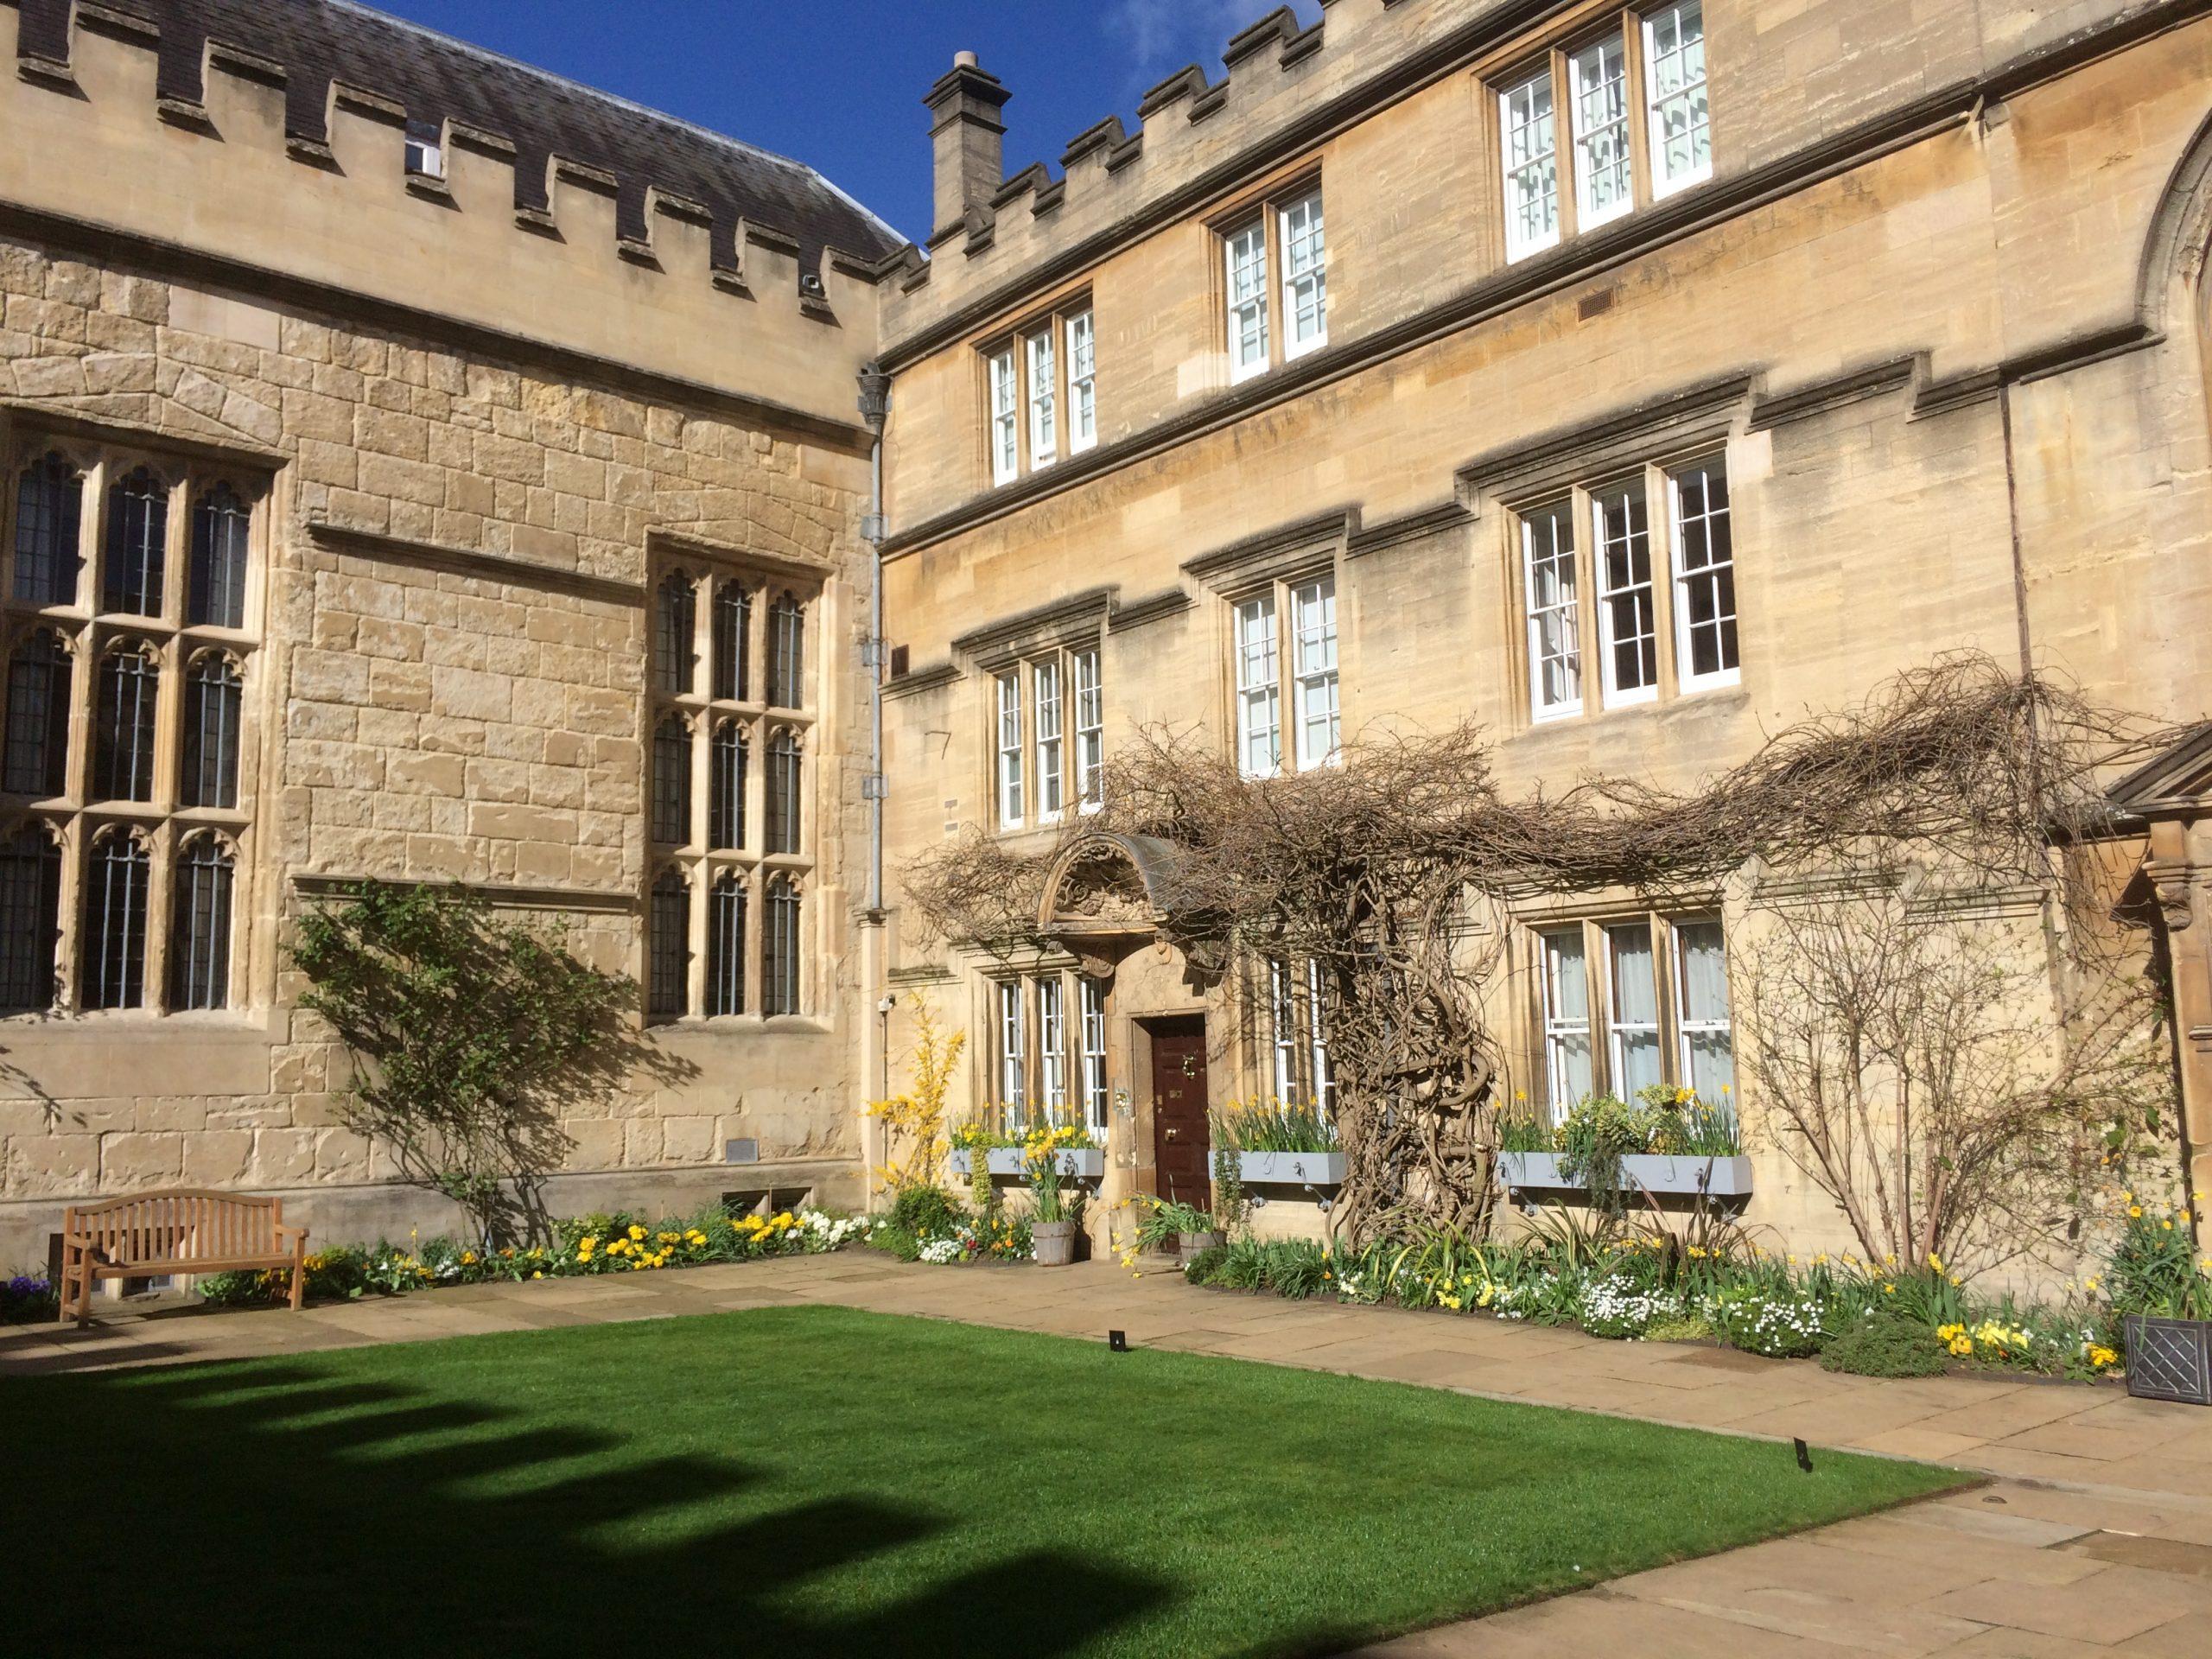 Jesus College Building, Oxford